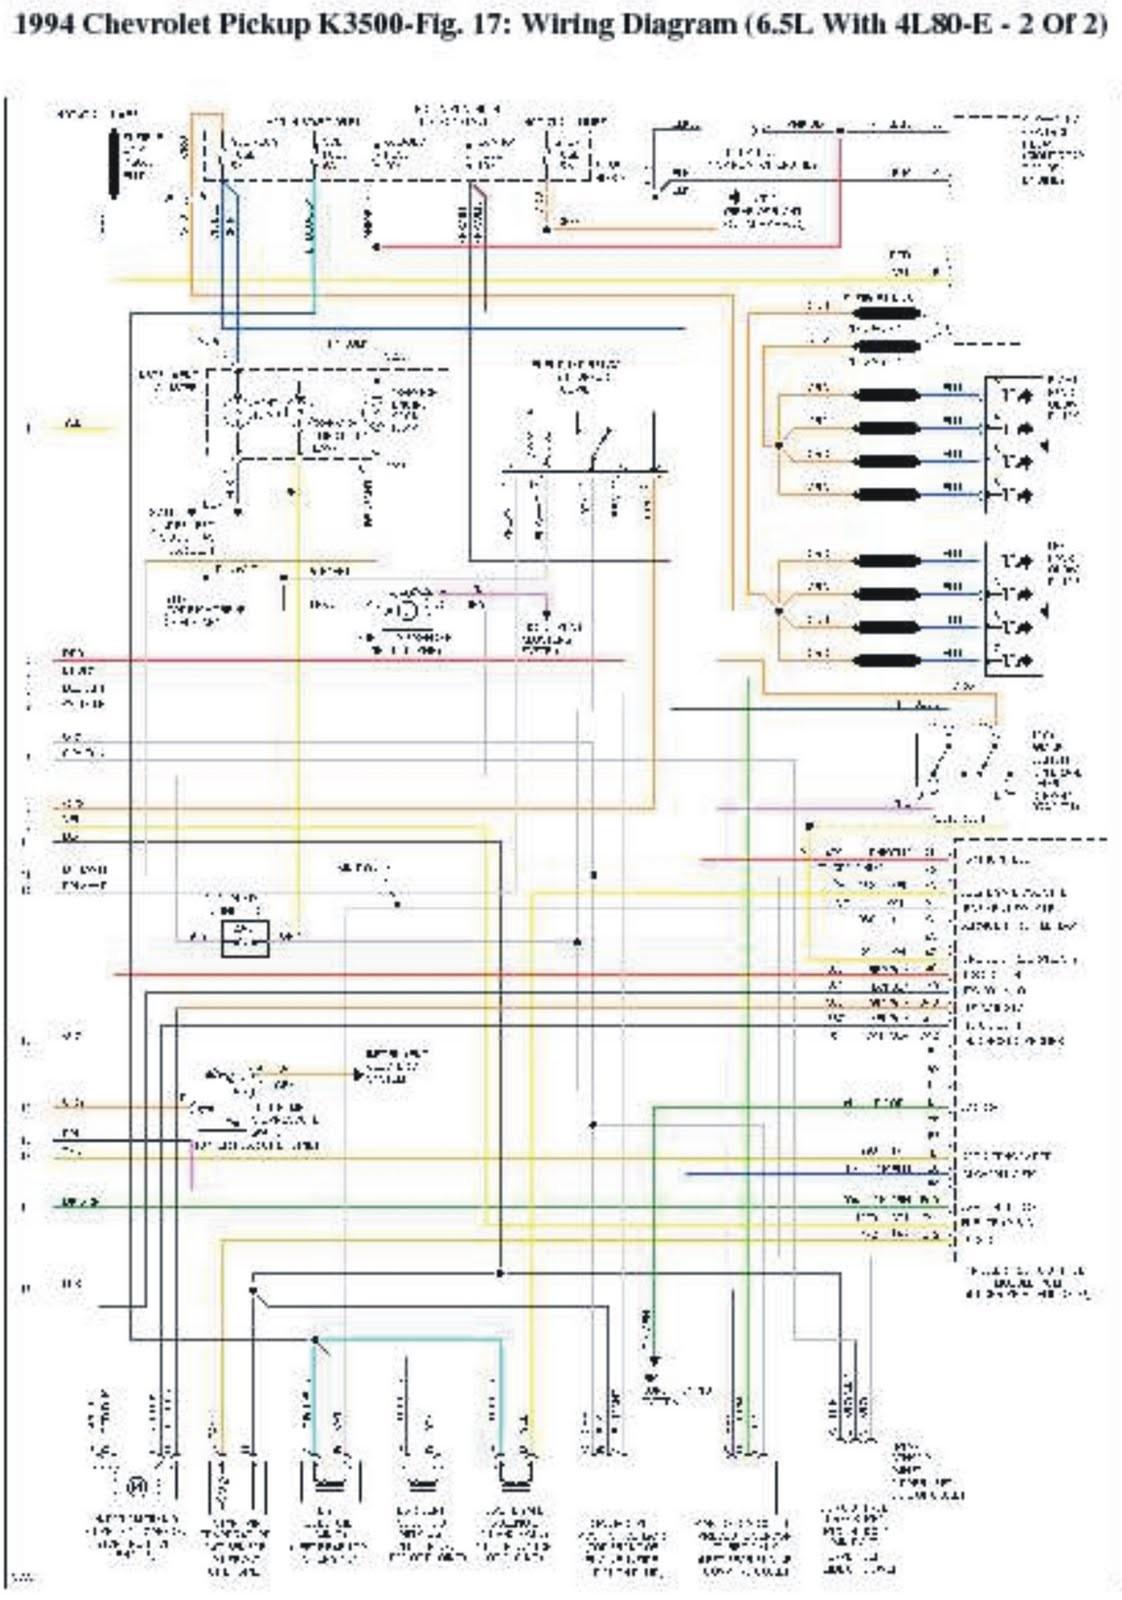 Remarkable 94 Chevy K2500 Transmission Wiring Diagram Basic Electronics Wiring Cloud Hisonepsysticxongrecoveryedborg